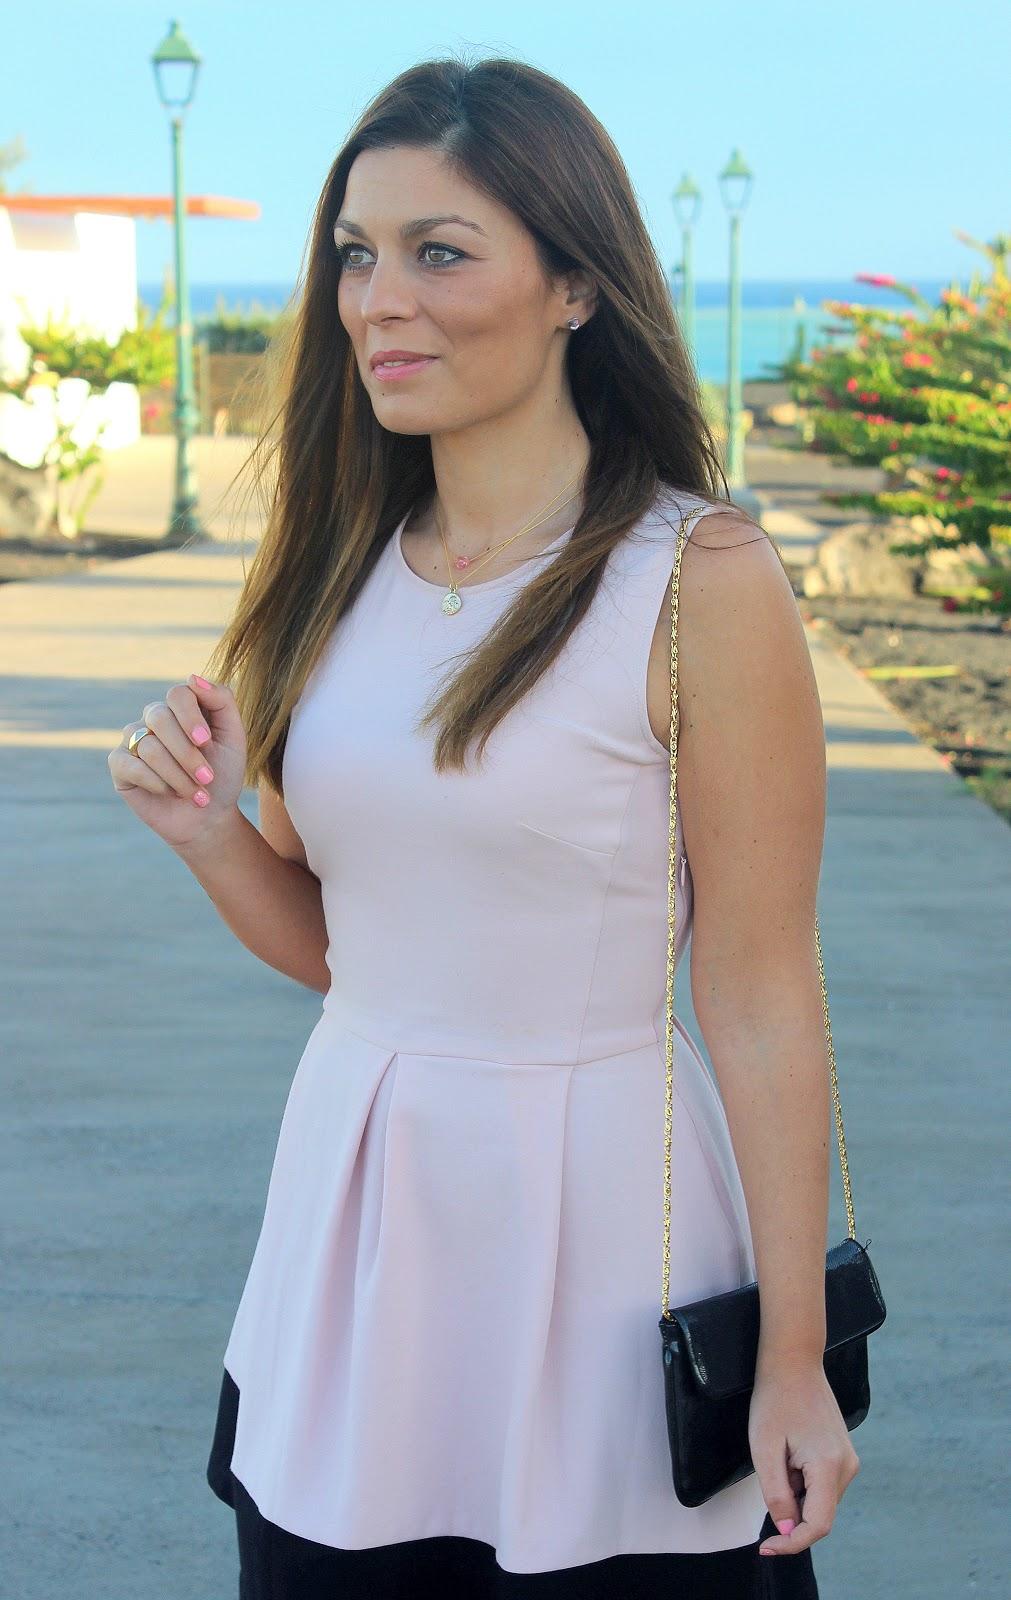 Pink_&_Black_Dress_The_Pink_Graff_06